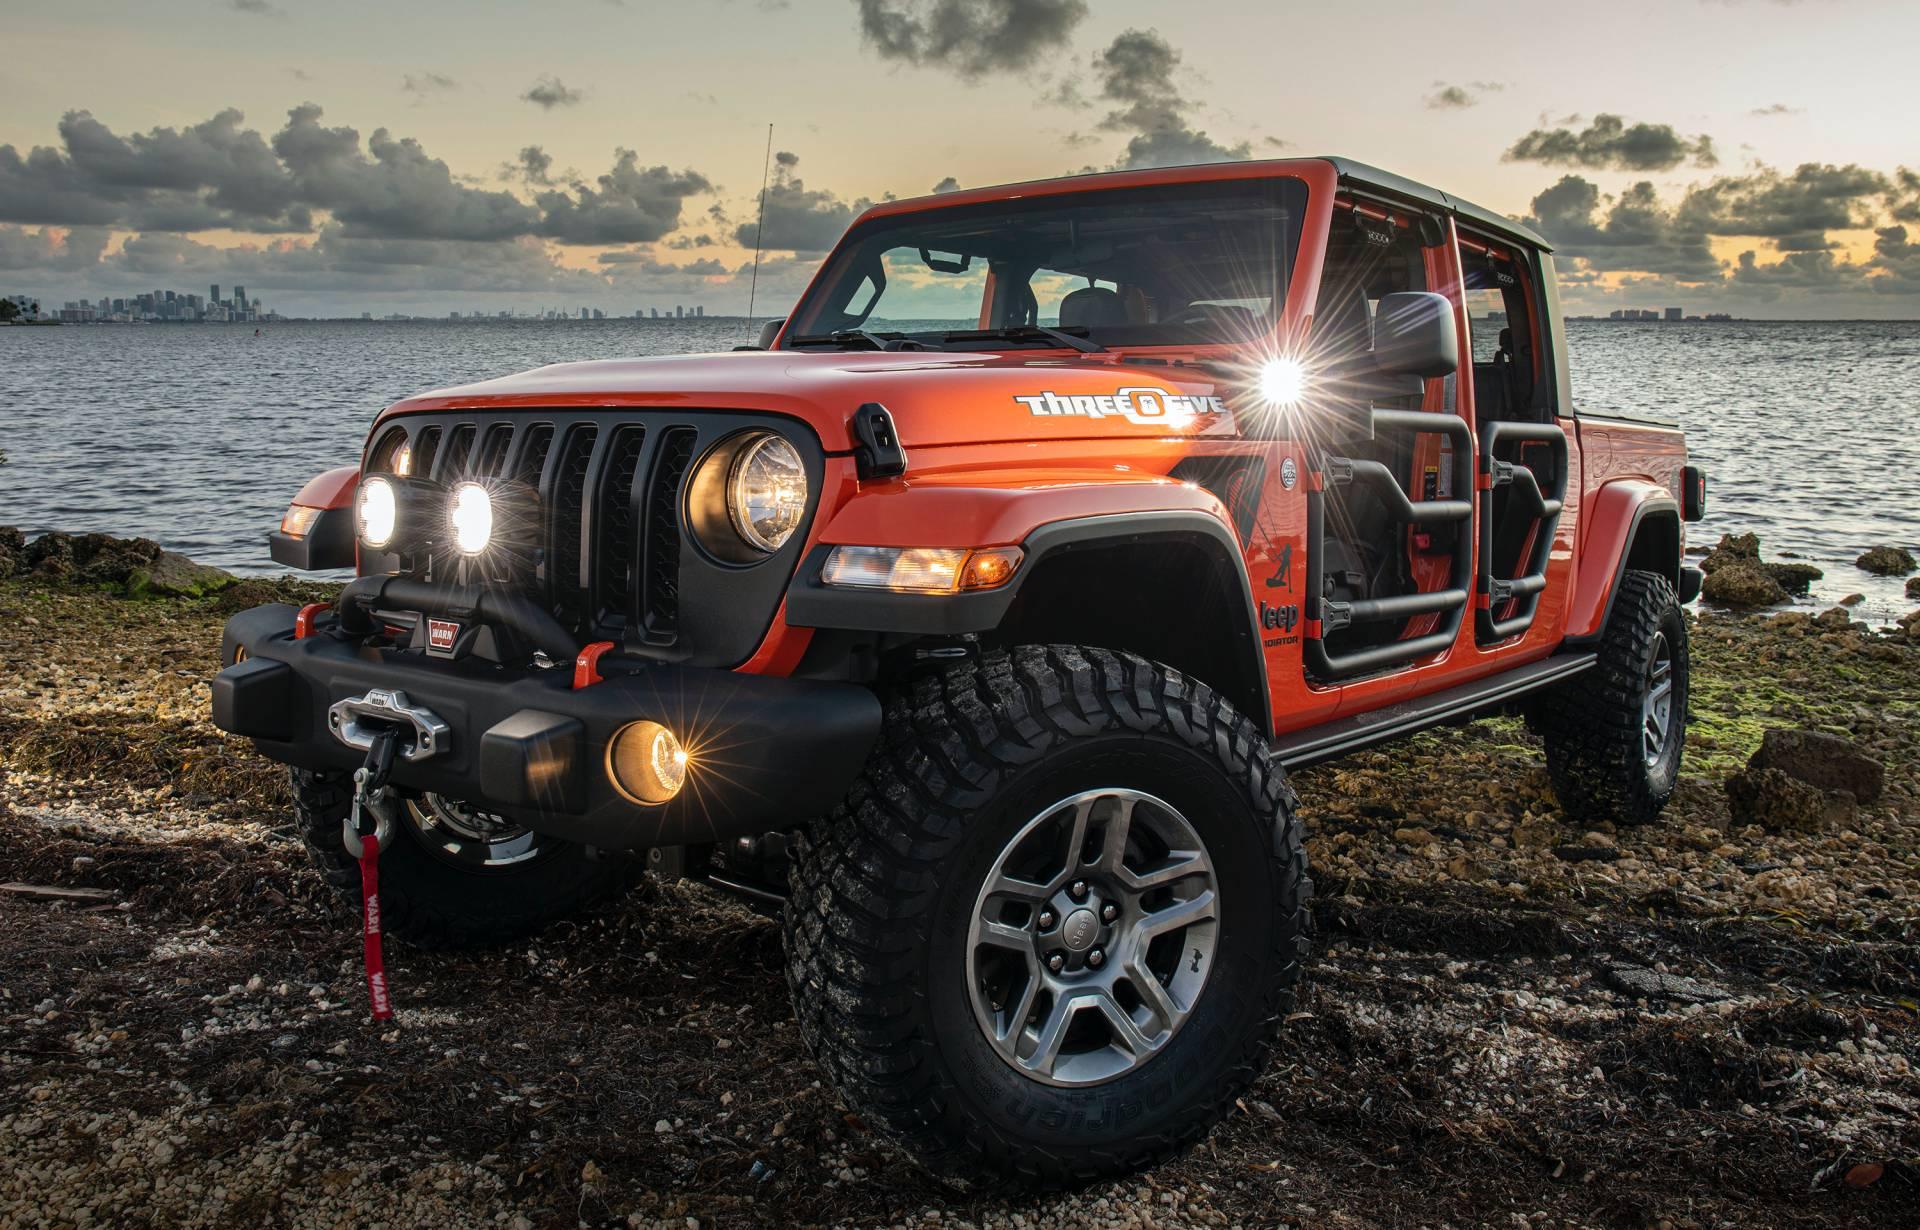 "2020-jeep-gladiator-""three-o-five""-edition-3"